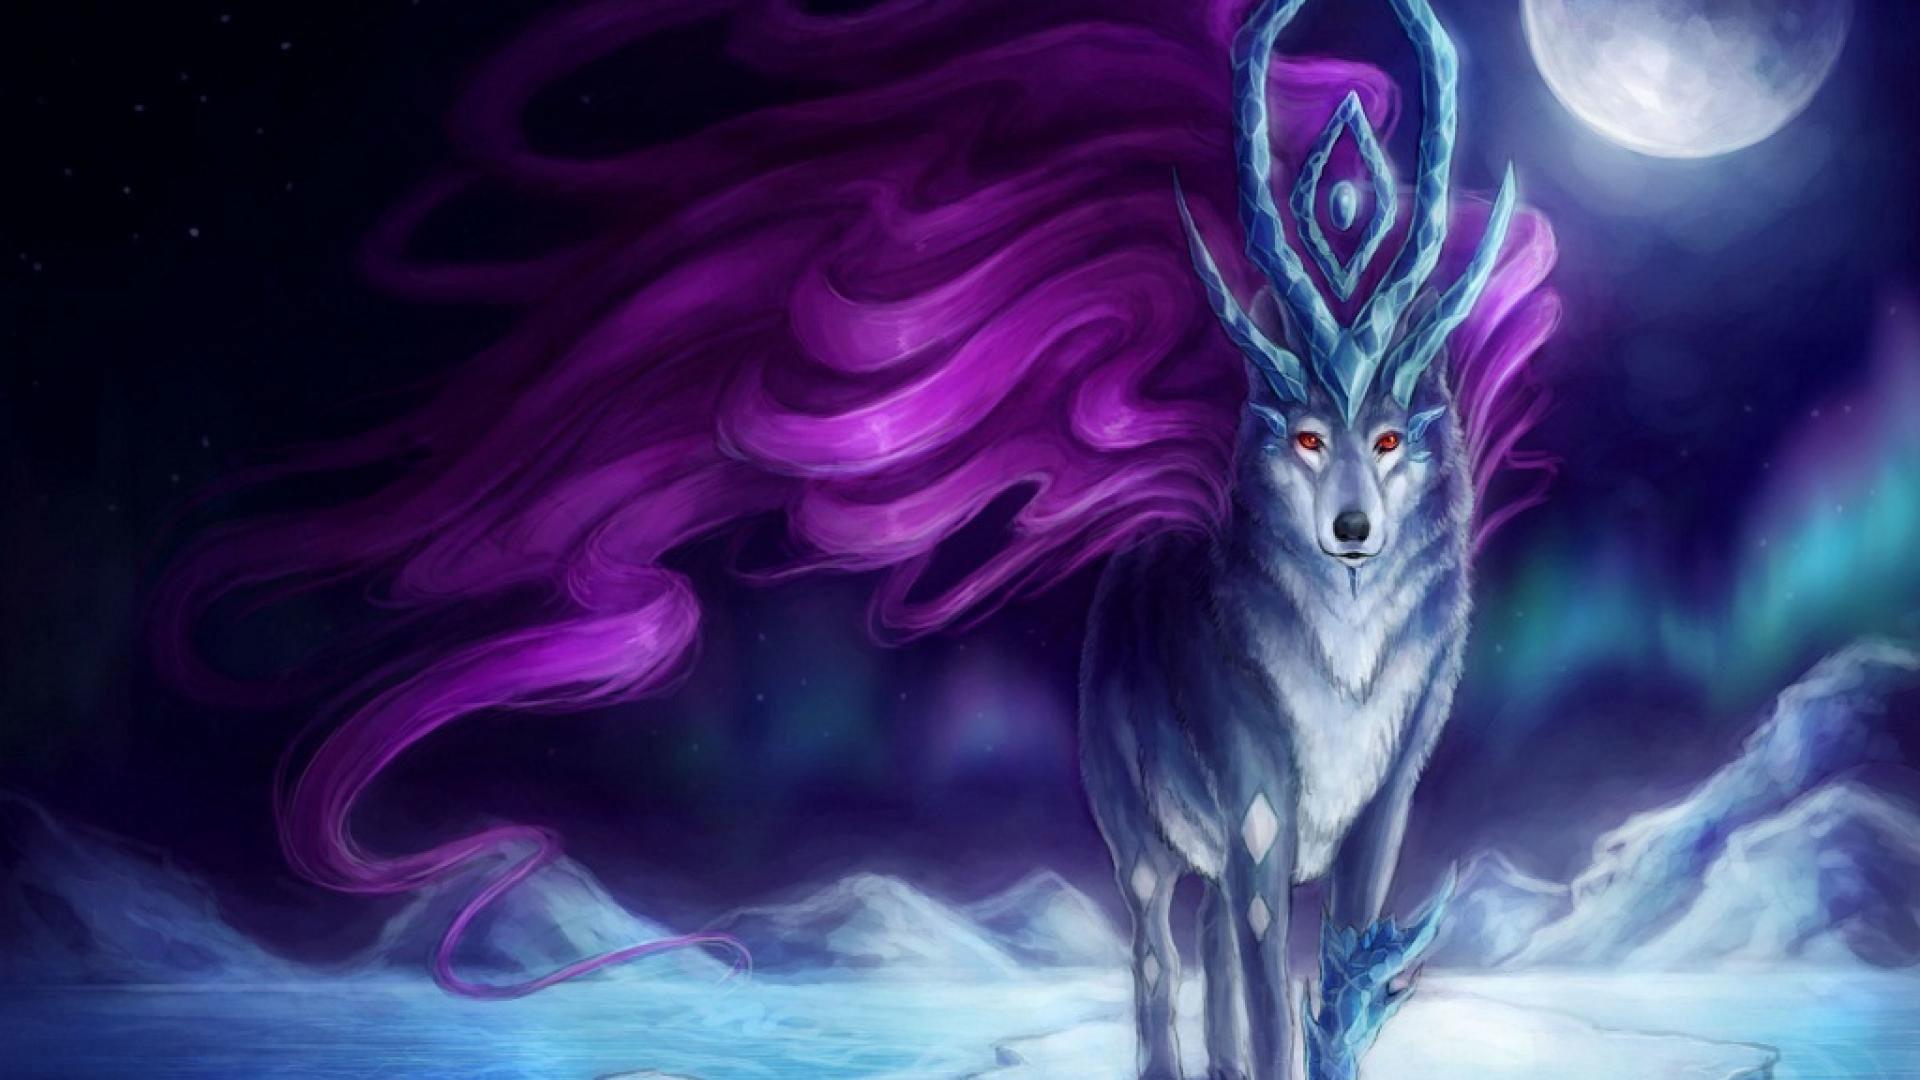 hd pics photos beautiful animated wolf polar animals hd quality desktop  background wallpaper